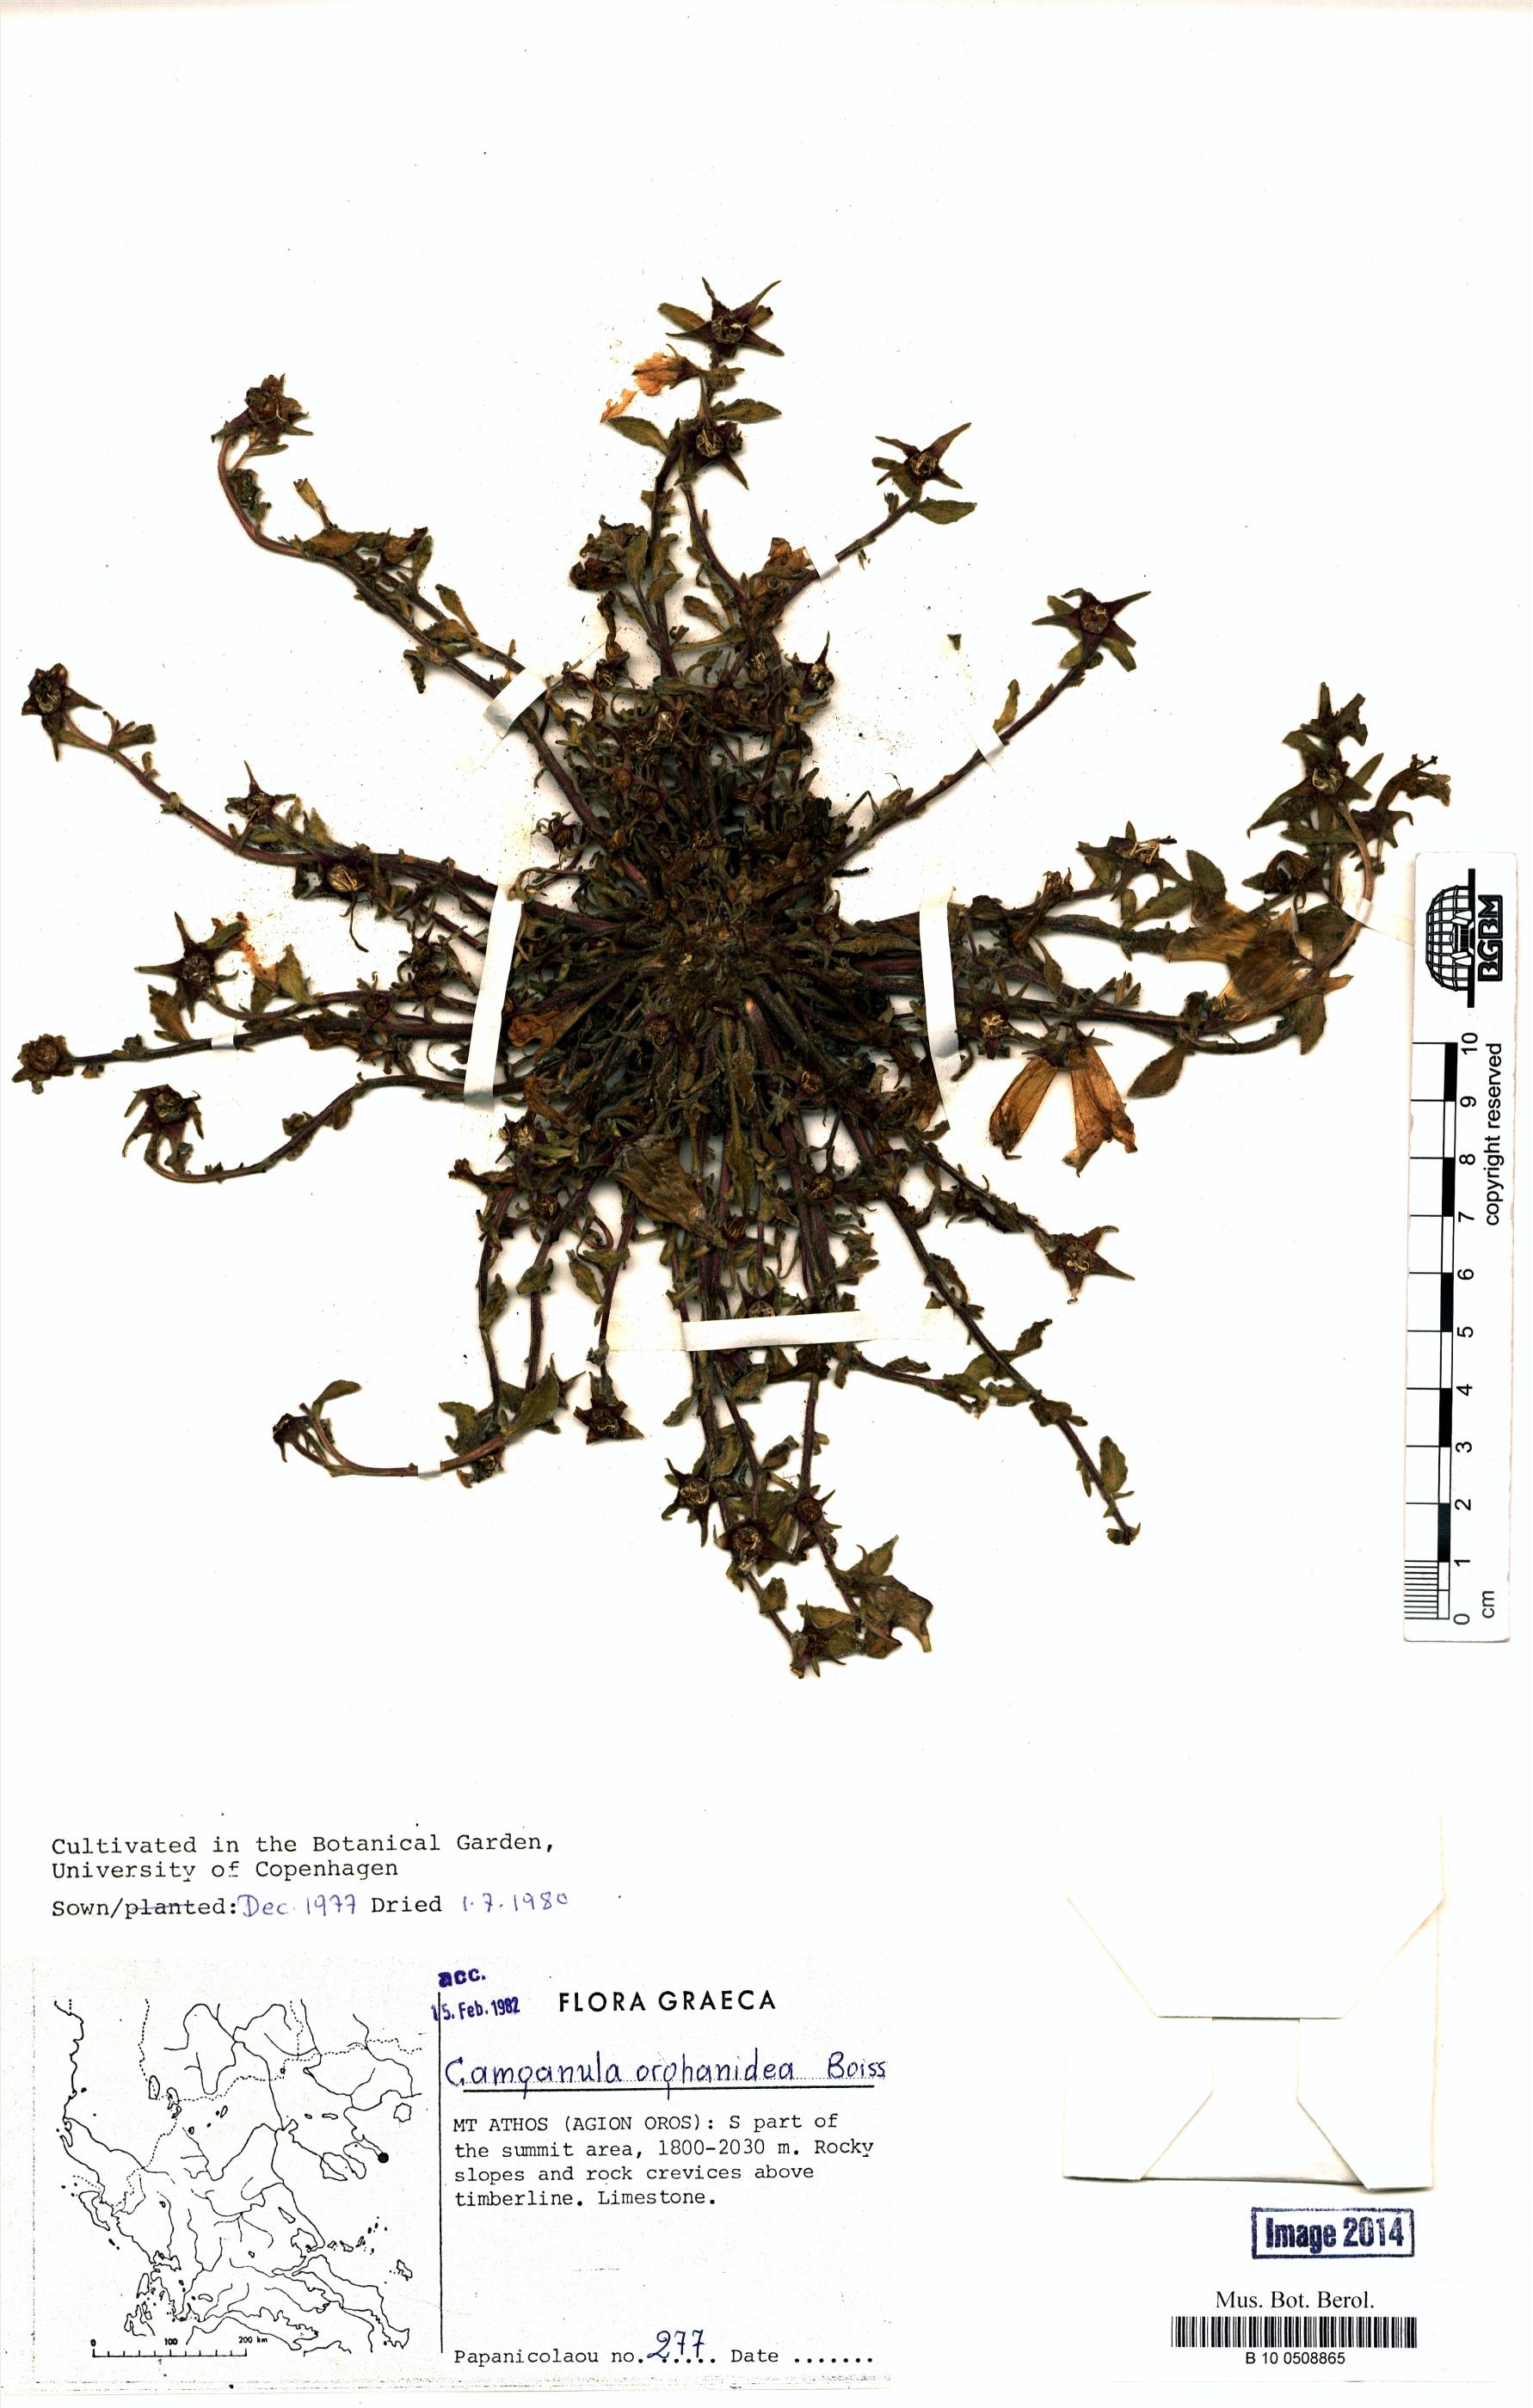 http://ww2.bgbm.org/herbarium/images/B/10/05/08/86/B_10_0508865.jpg